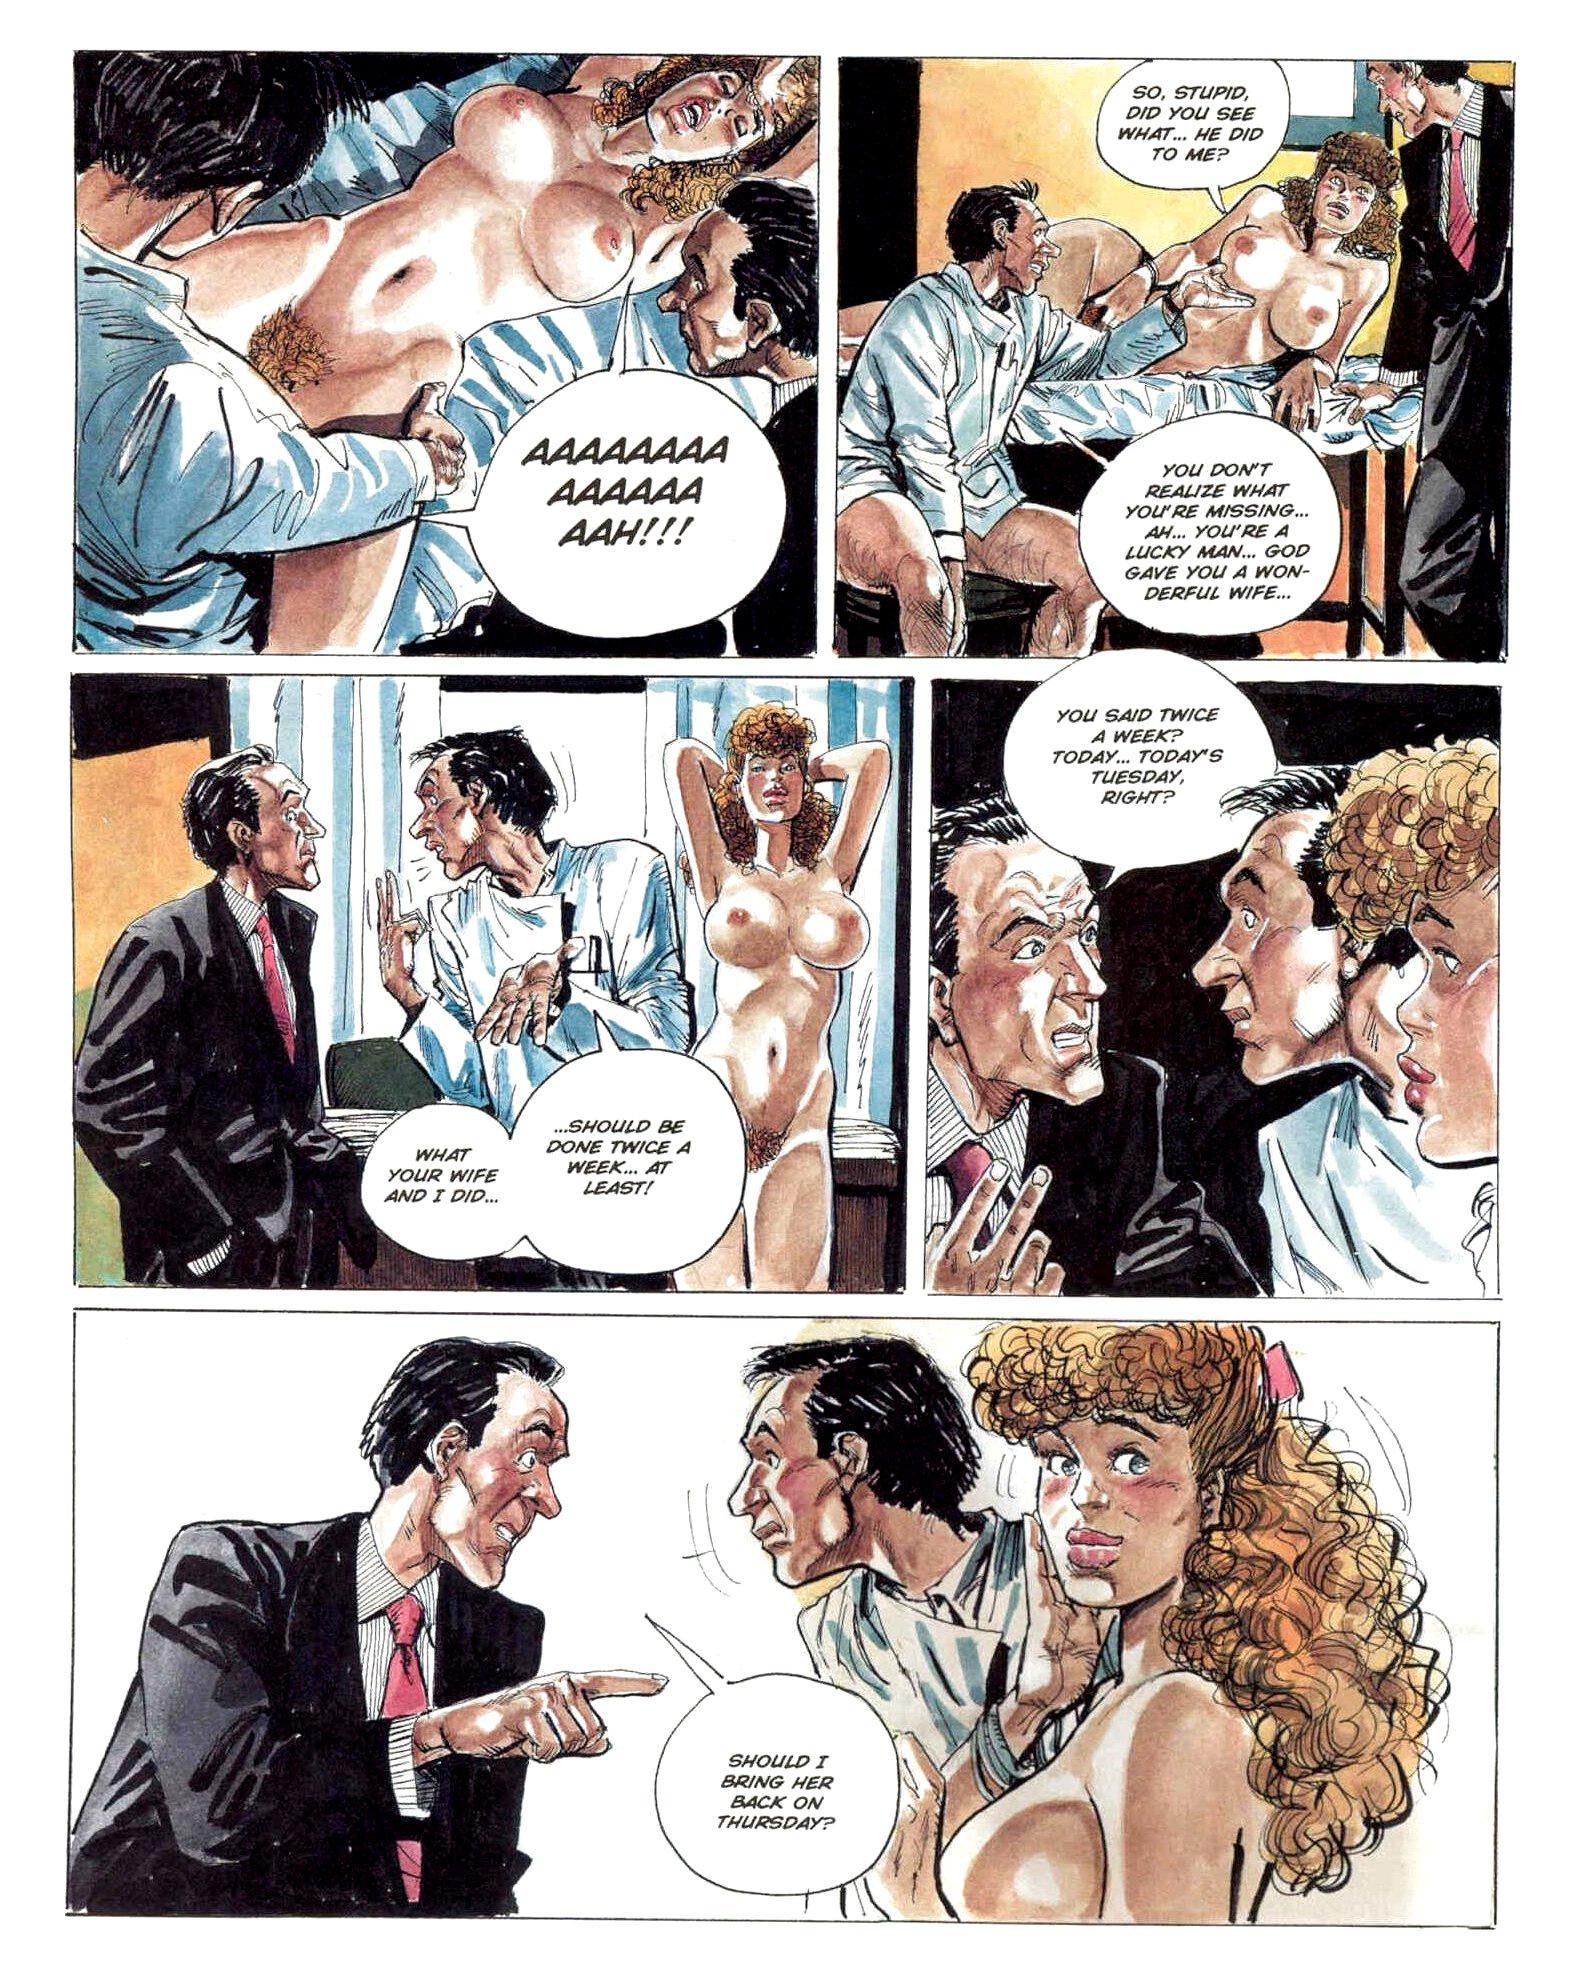 Adult Sex Cartoon Pics what the doctor orderedhoracio altuna zizki sex and porn